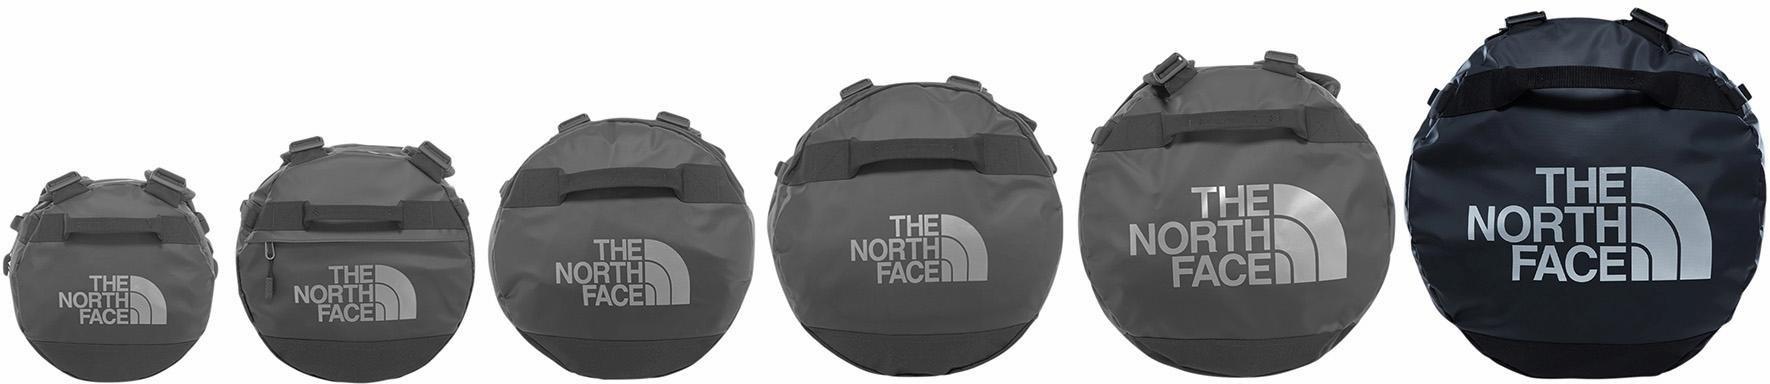 Reistas base DuffelXxl Camp Kopen The Face North Online NnZ80wOkPX